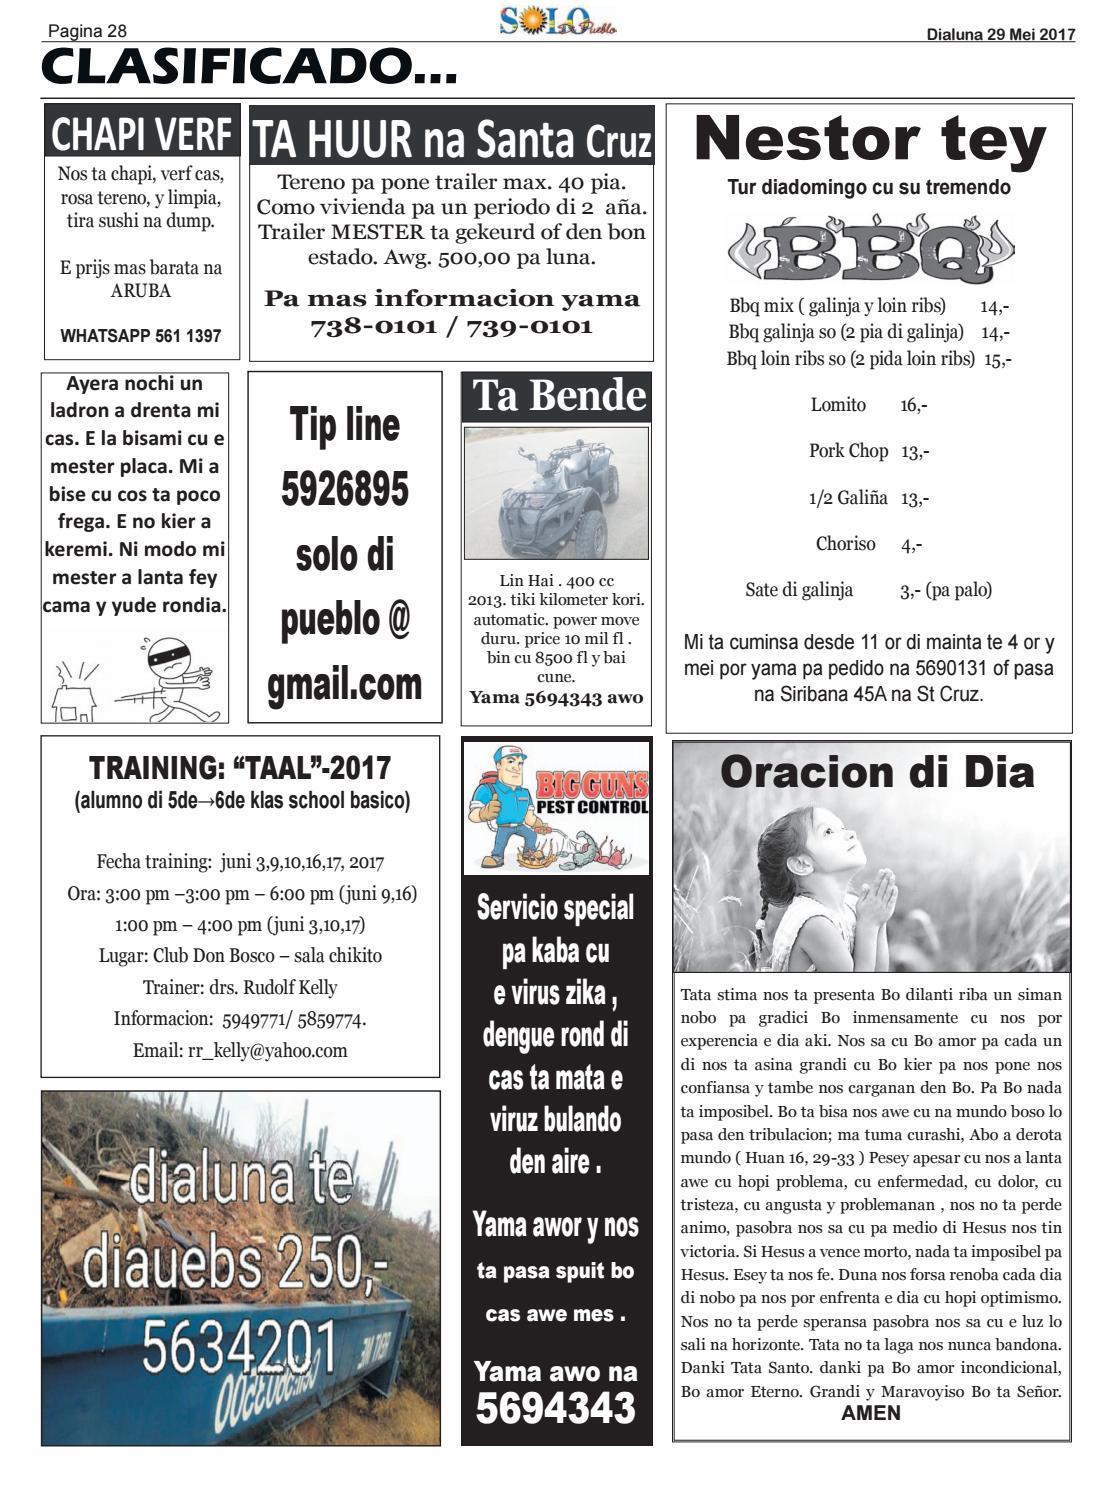 Dialuna 29 Mei 2017 By Solo Di Pueblo Issuu